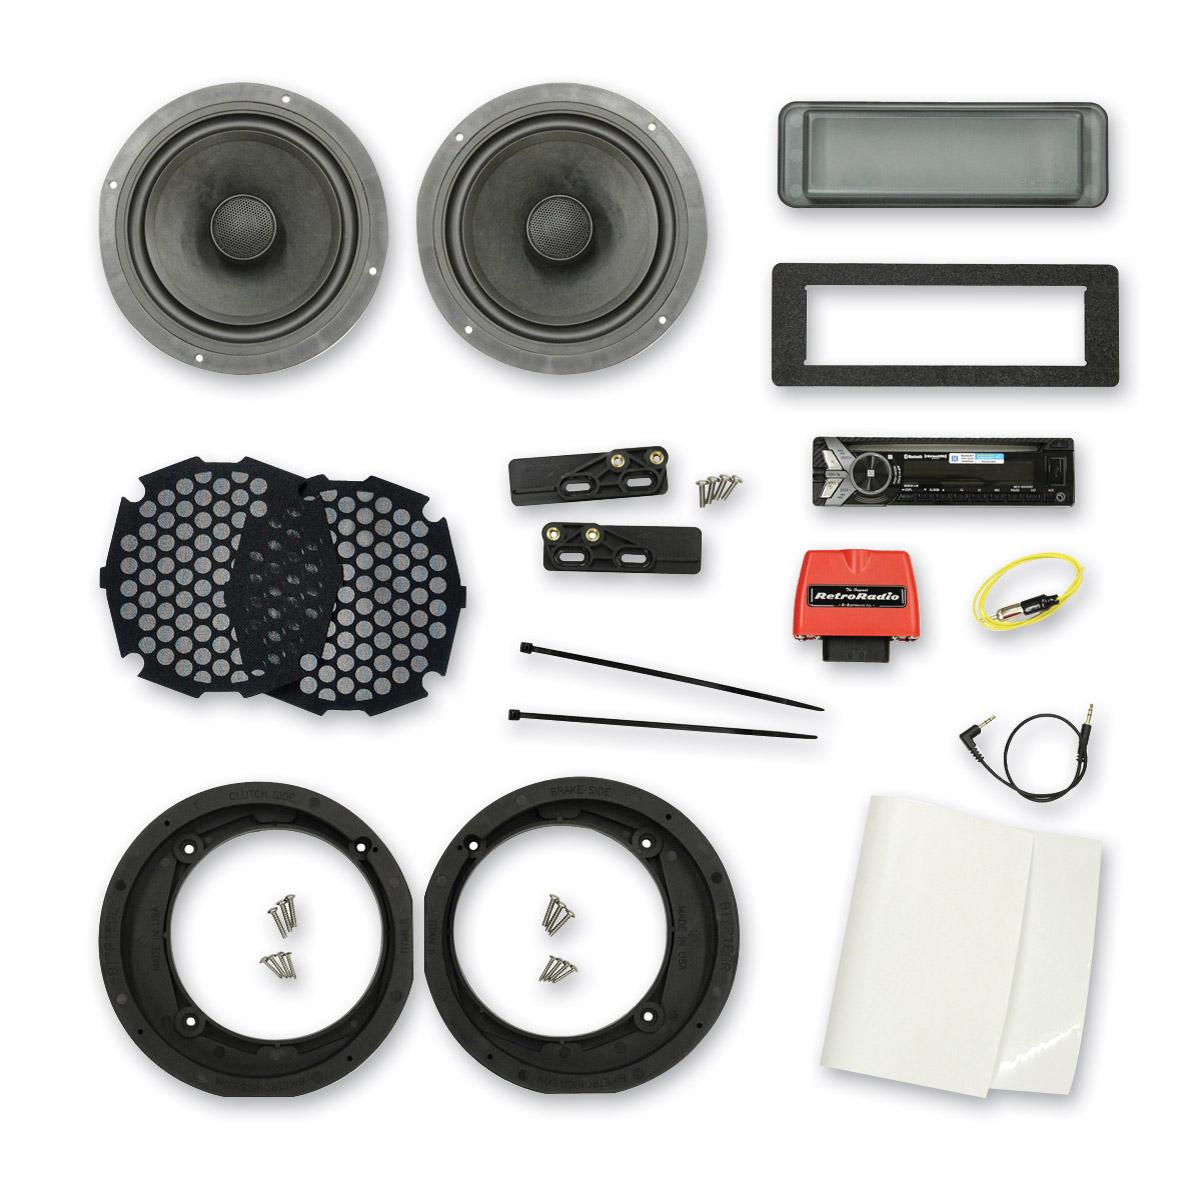 Biketronics Radio & 7.1″ Speaker Kit with Sony MEX-N5000BT Stereo